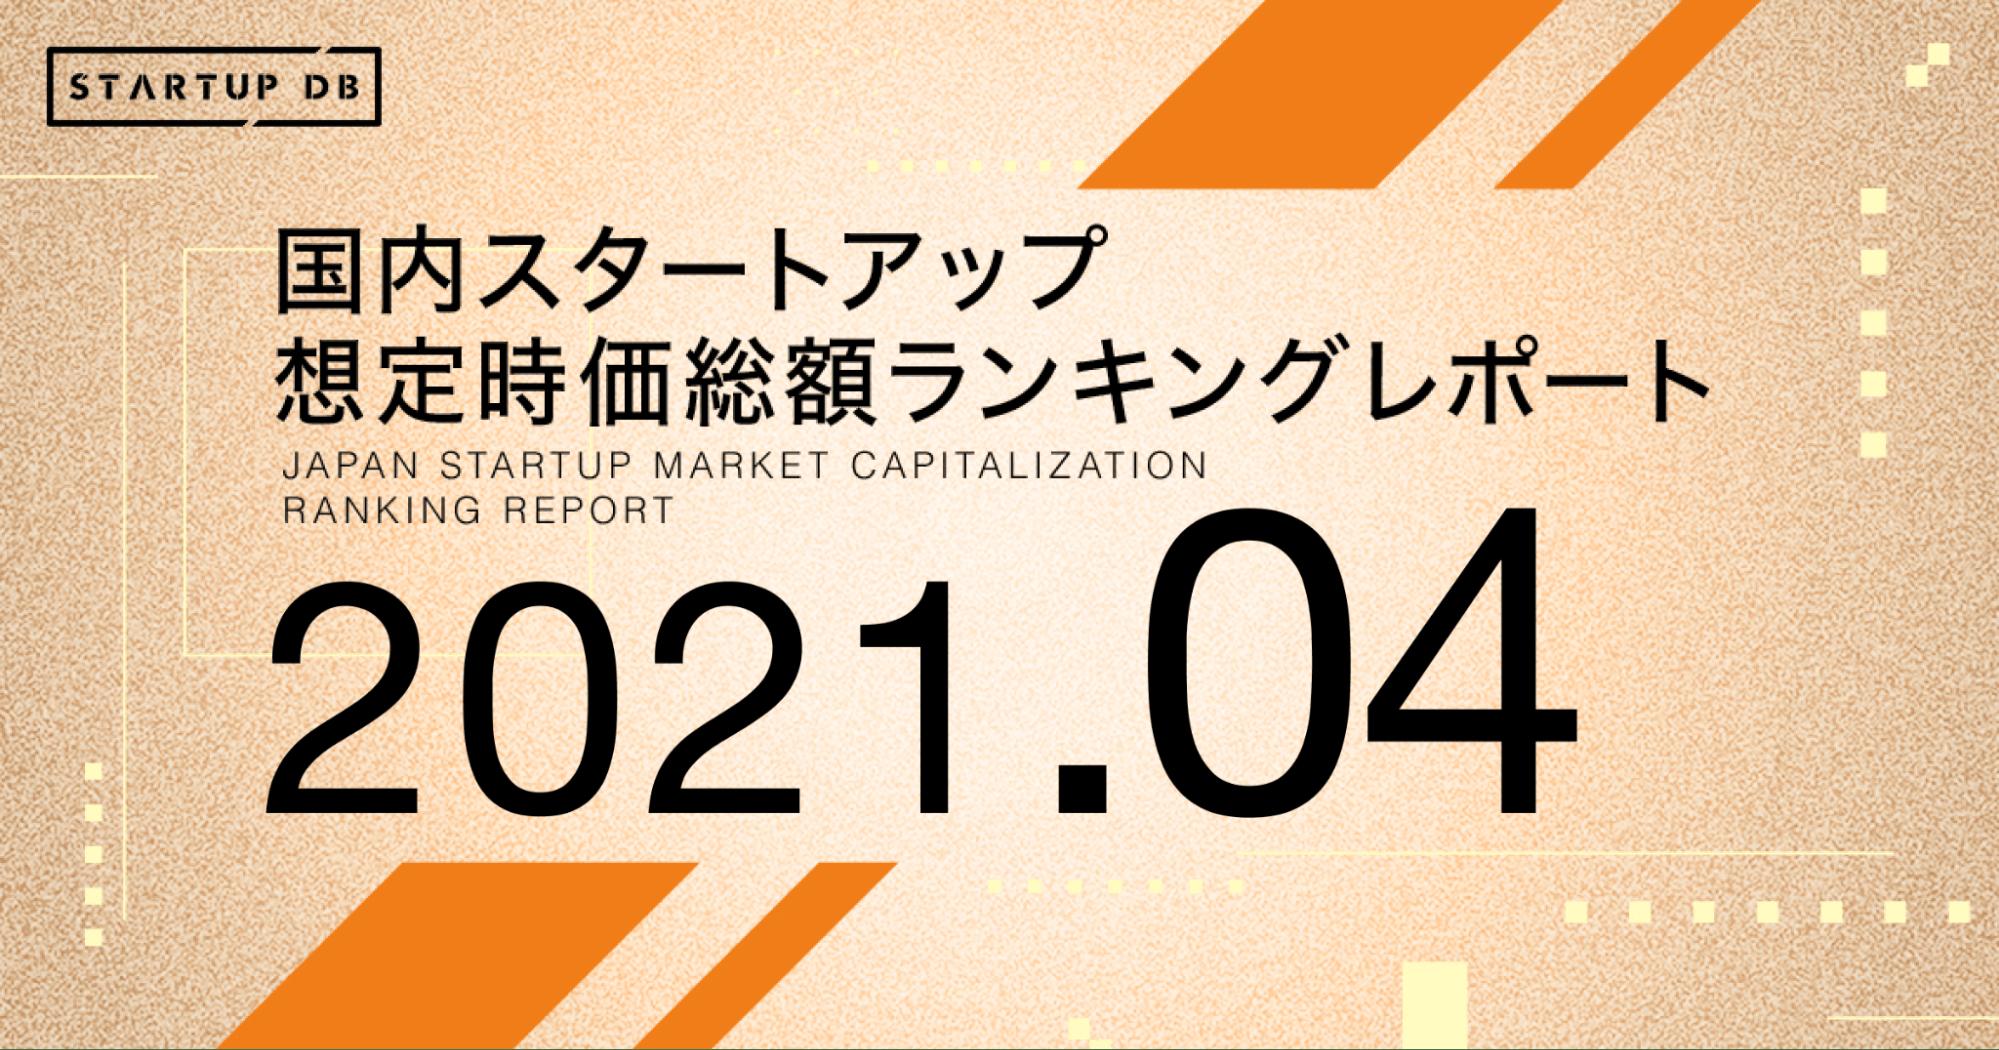 【STARTUP DB】調査結果 国内スタートアップ想定時価総額ランキング(2021年4月)